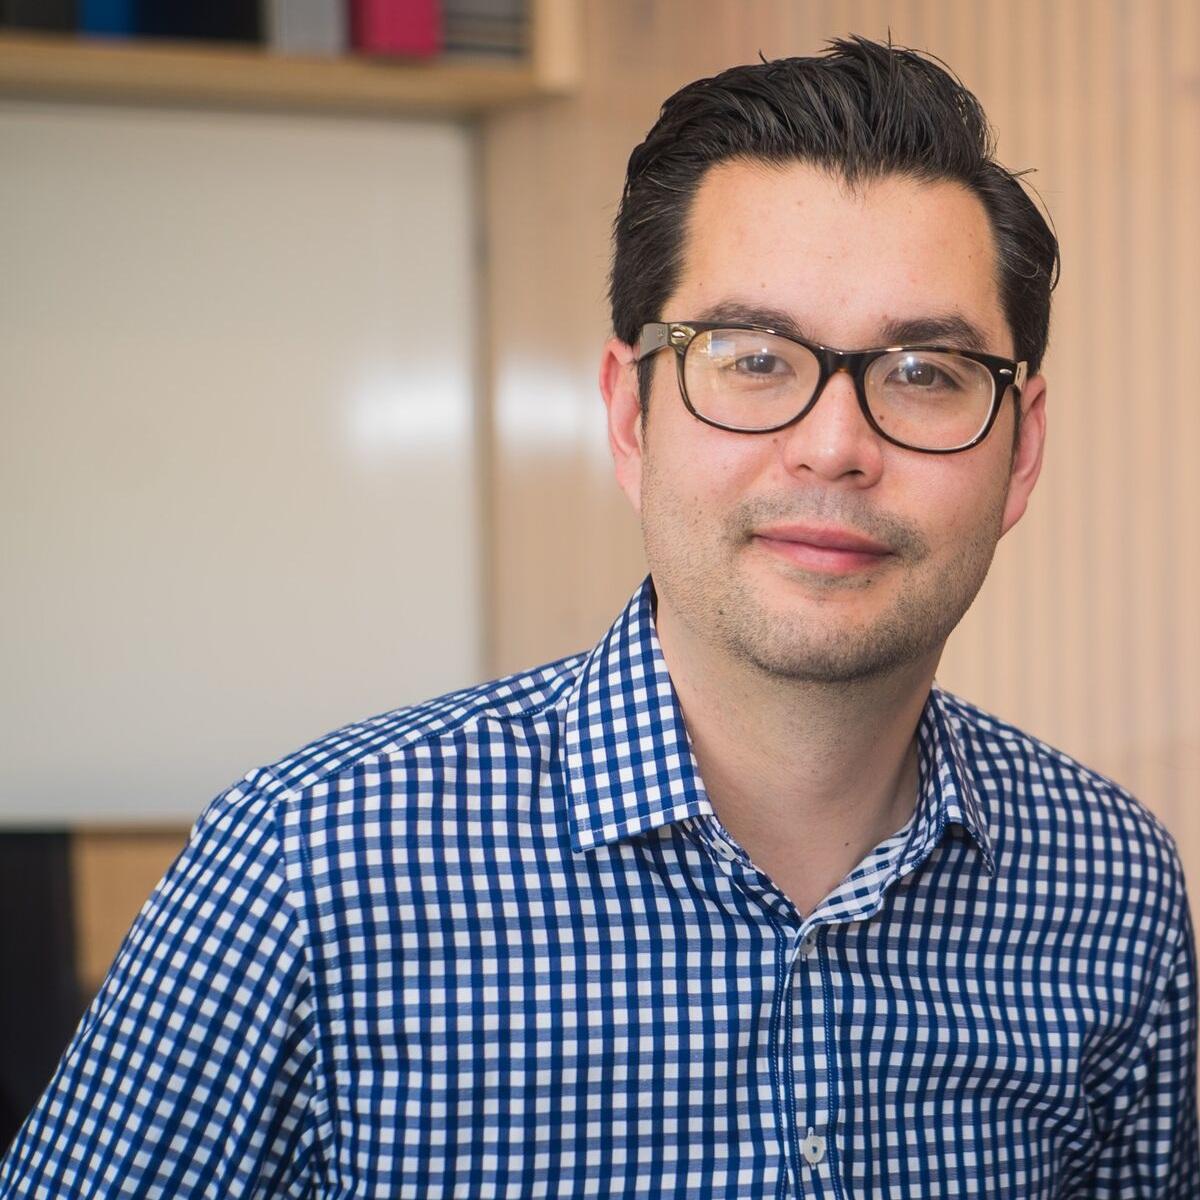 Alan Tsen - GENERAL MANAGER,STONE & CHALKCEO, FINTECH VICTORIA